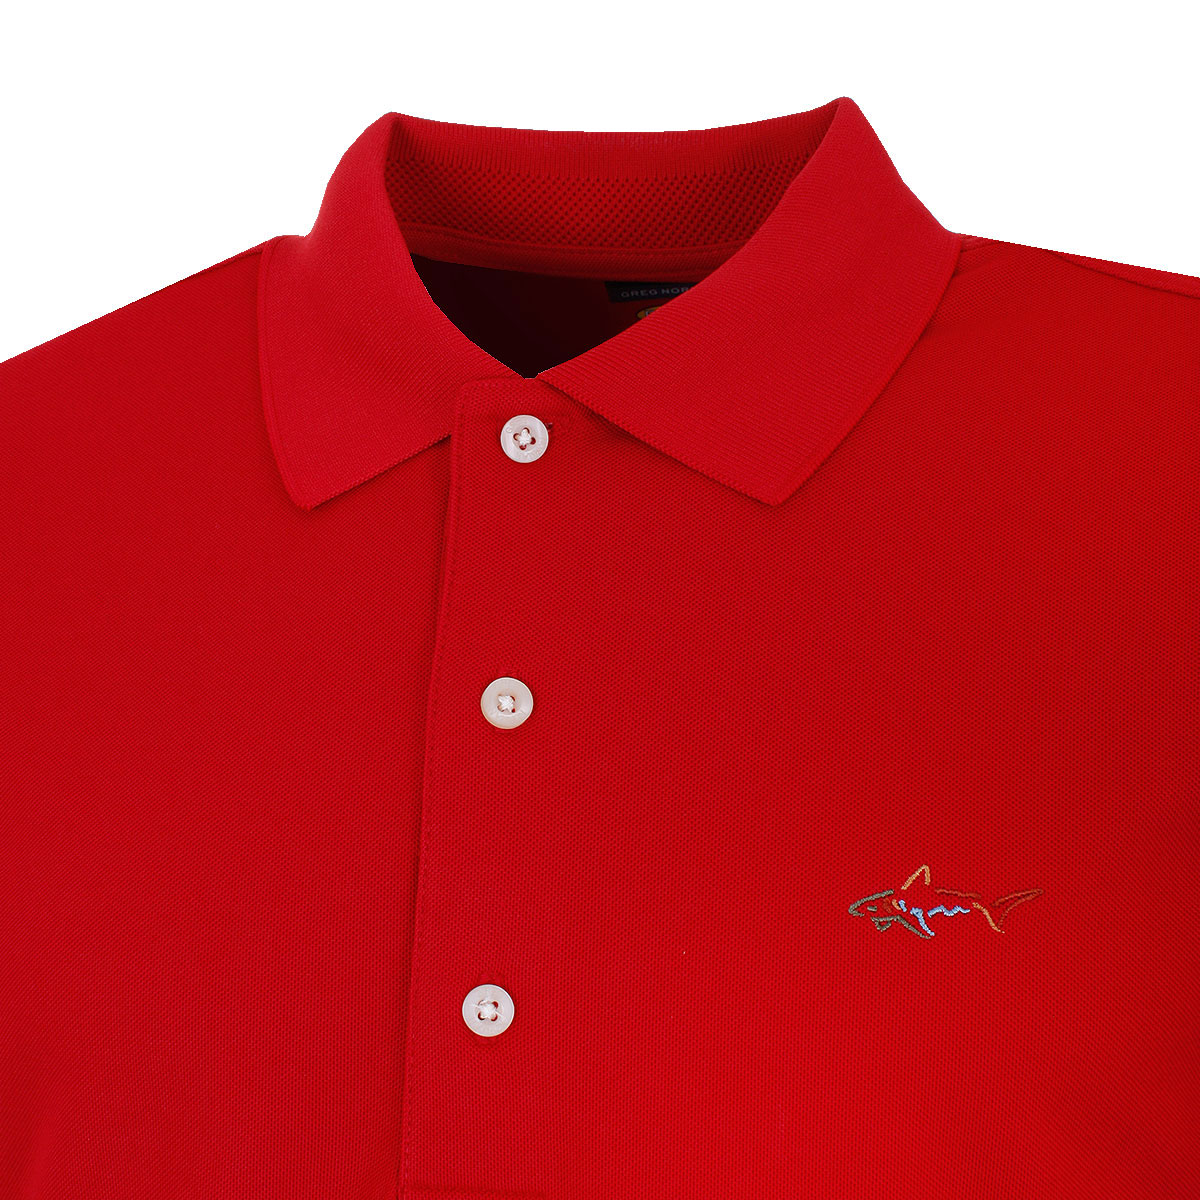 Greg-Norman-Mens-KX04-Performance-Micro-Pique-Golf-Polo-Shirt-28-OFF-RRP thumbnail 20